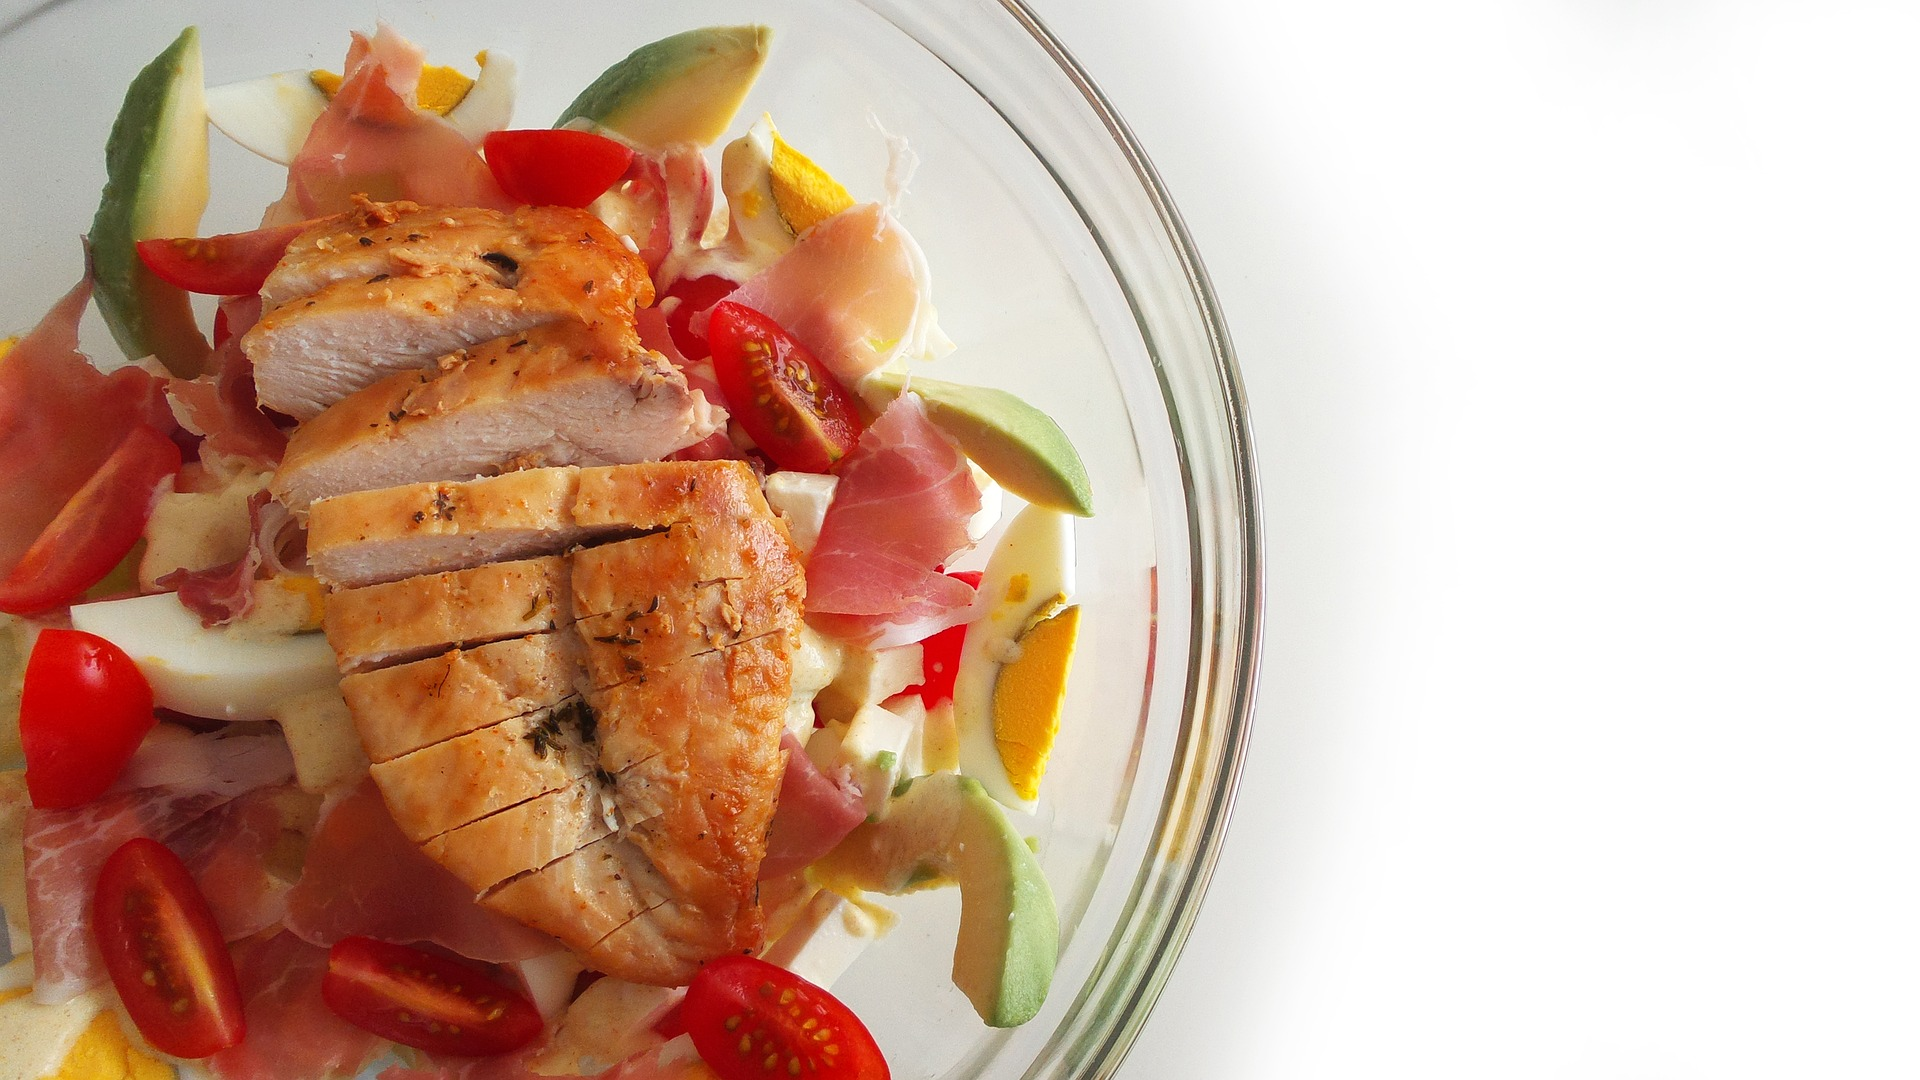 retete pentru o cina usoara - Salata de pui -sfatulparintilor.ro-pixabay_com - cobb-salad-2736125_1920